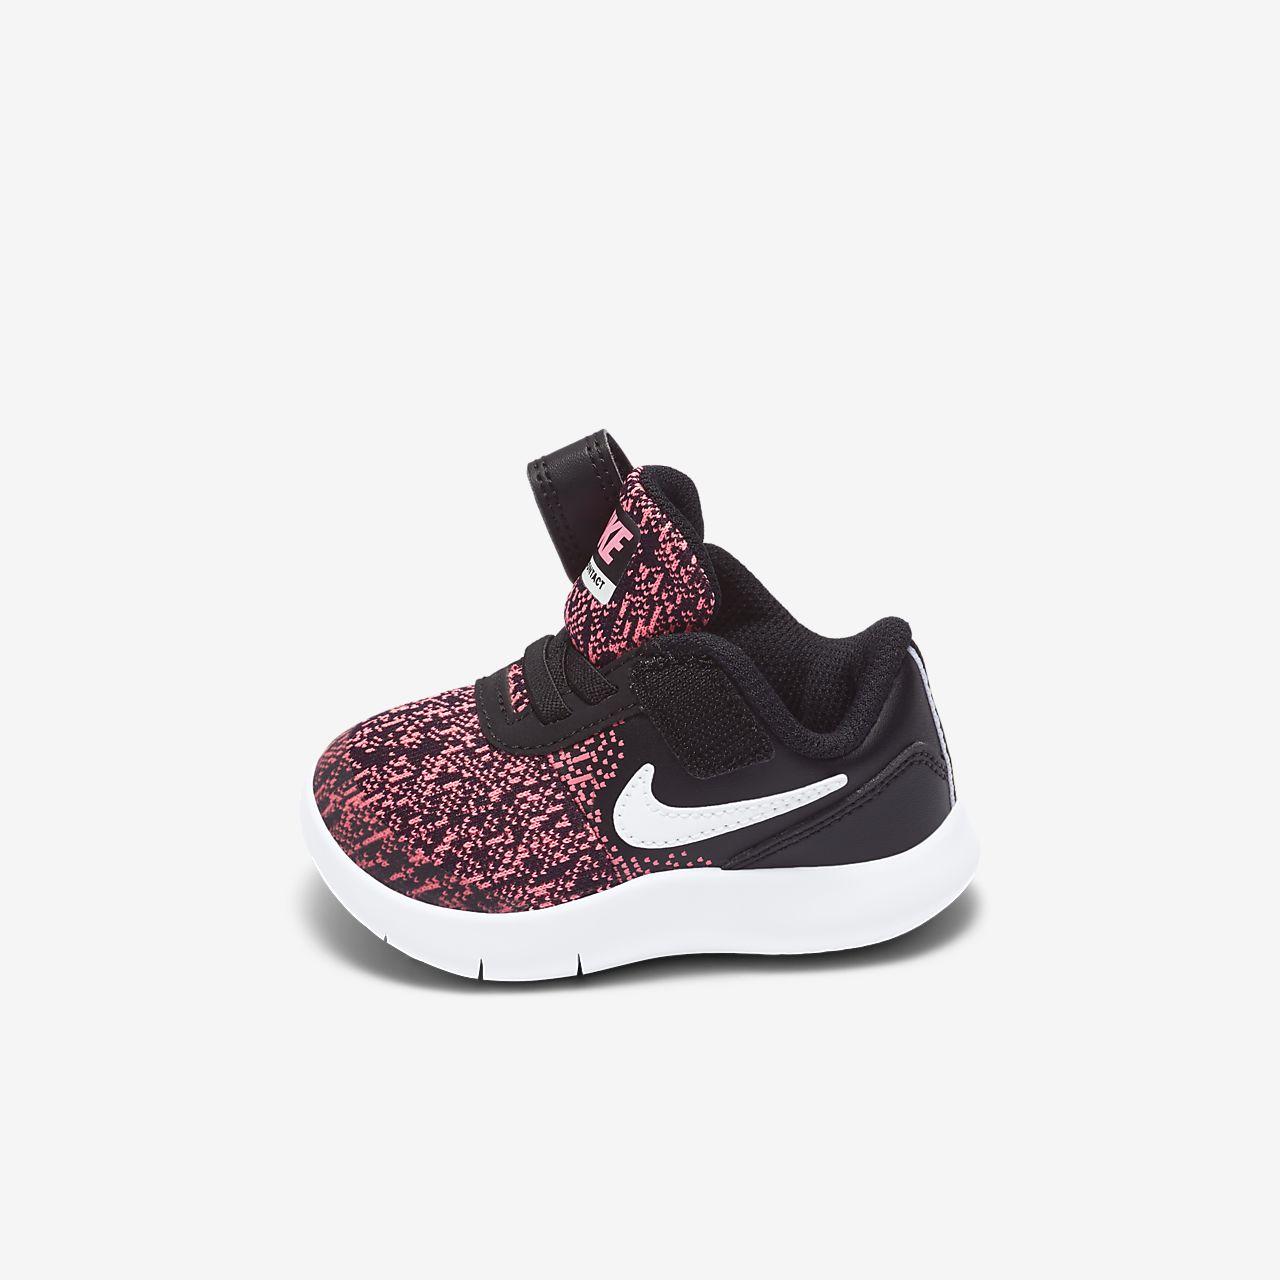 new product 6dca3 f2a4b Nike Flex Experience 5 Grå Jente Barn Treningssko (730862DMX)